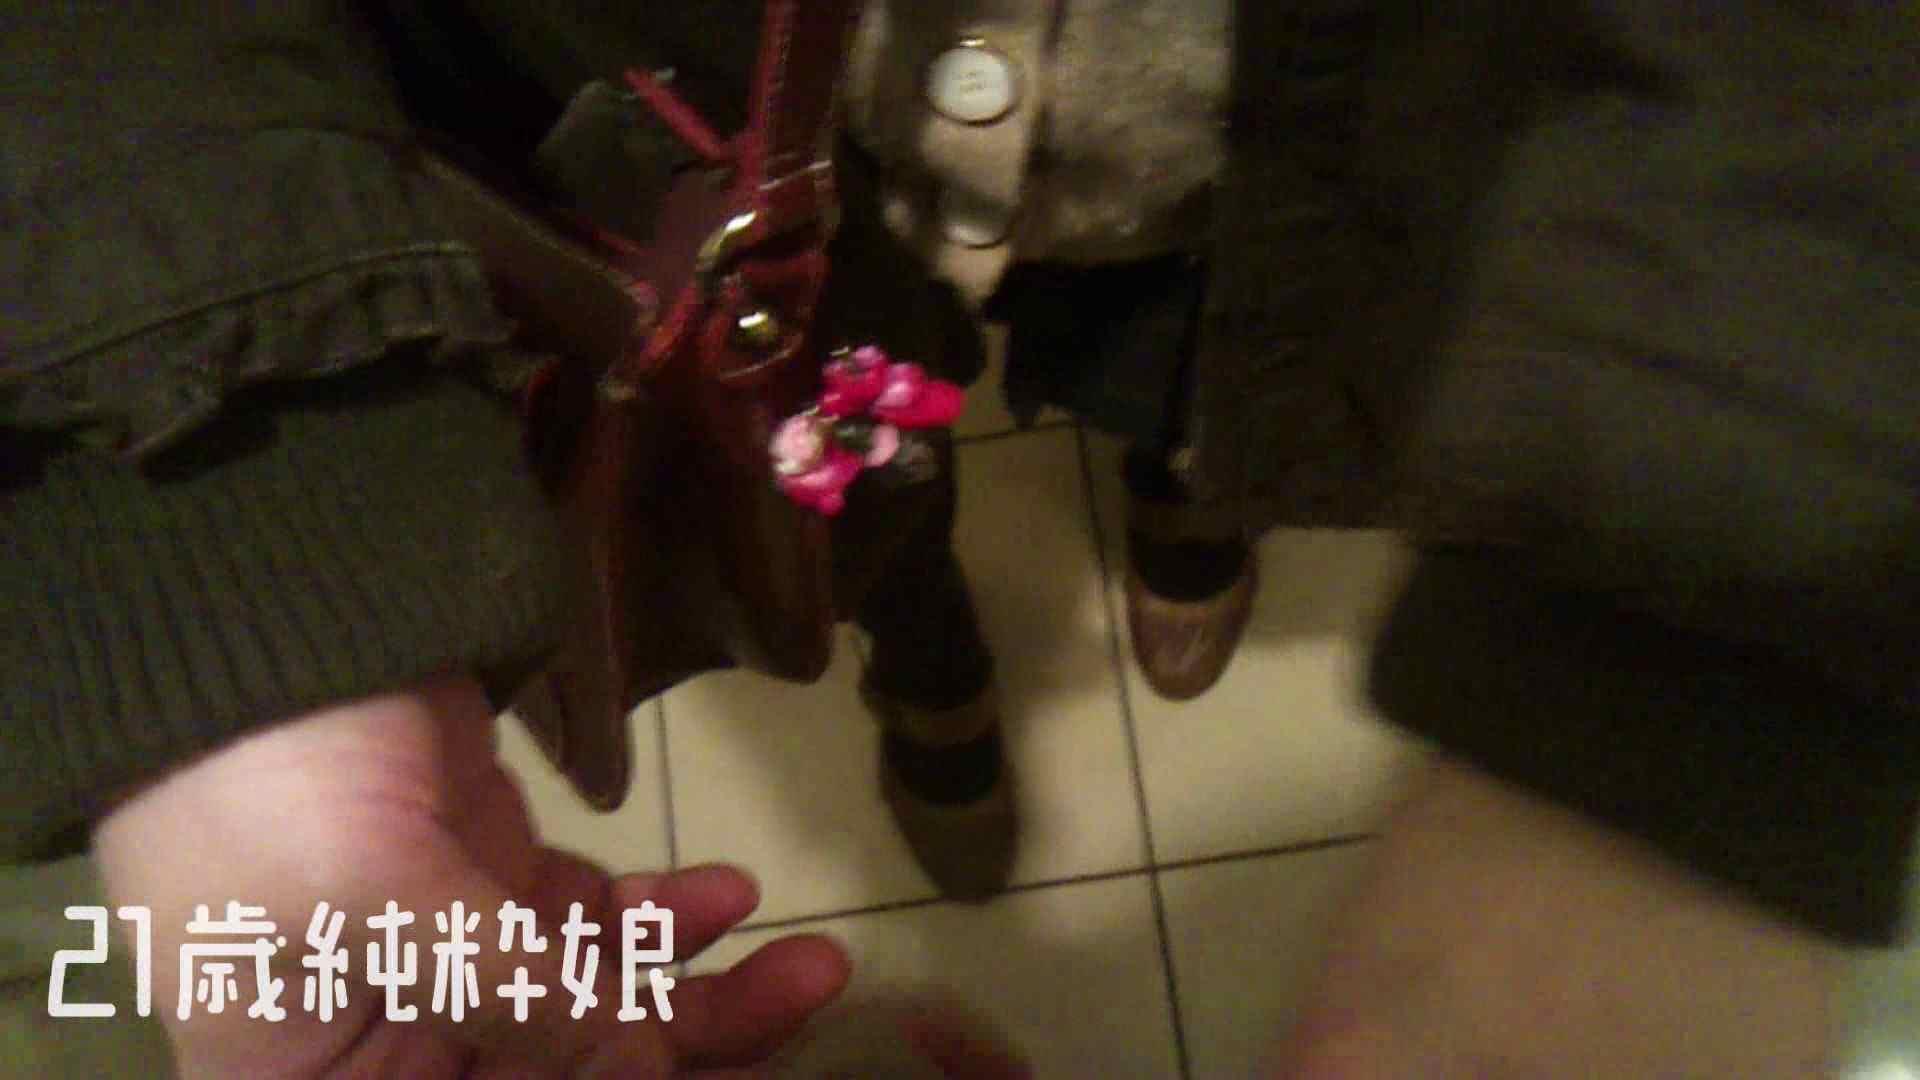 Gカップ21歳純粋嬢第2弾Vol.5 一般投稿 | エッチなOL  77pic 25